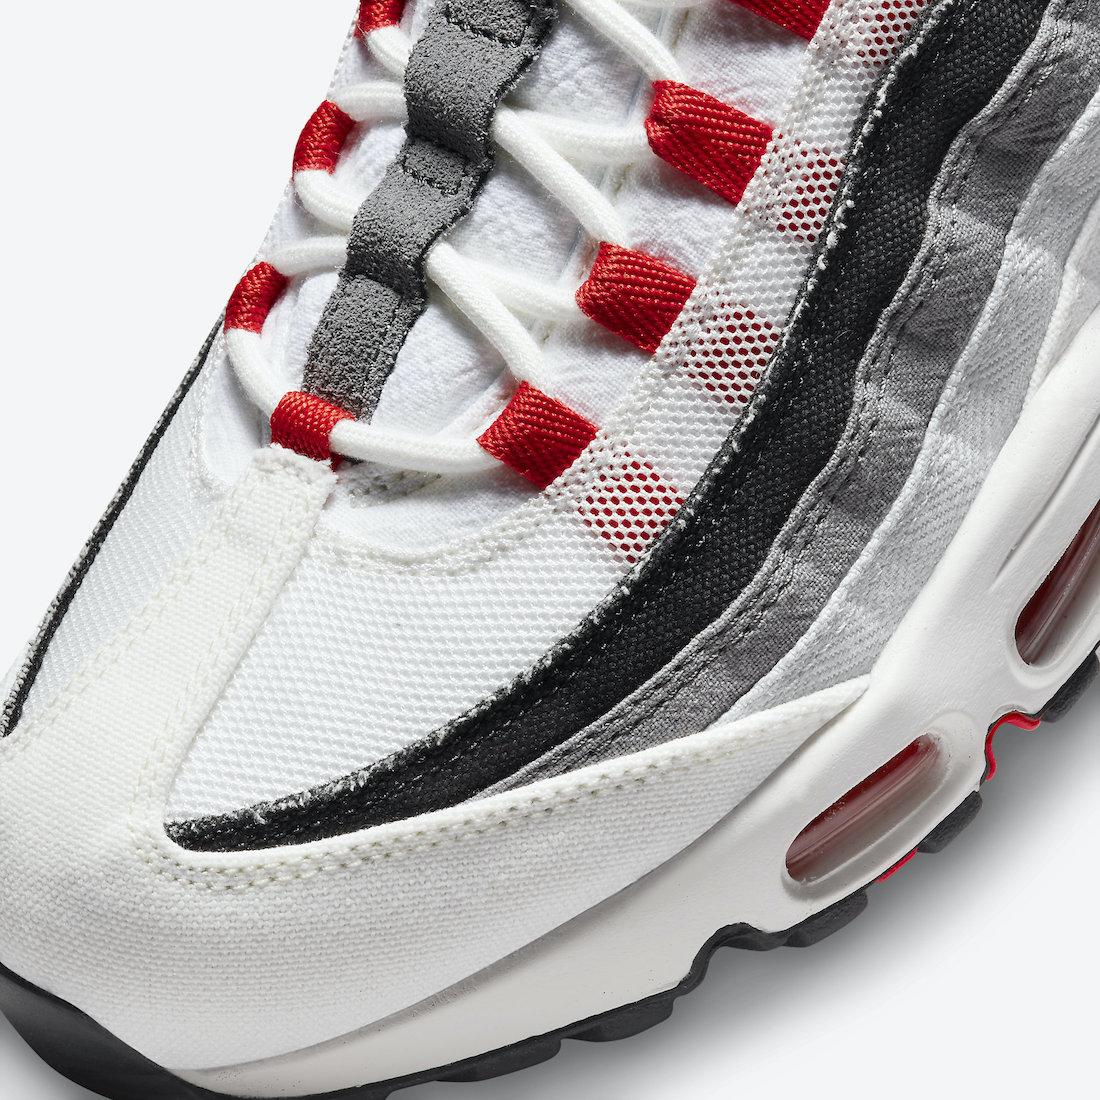 Nike Air Max 95 Japan DH9792-100 Release Date Info